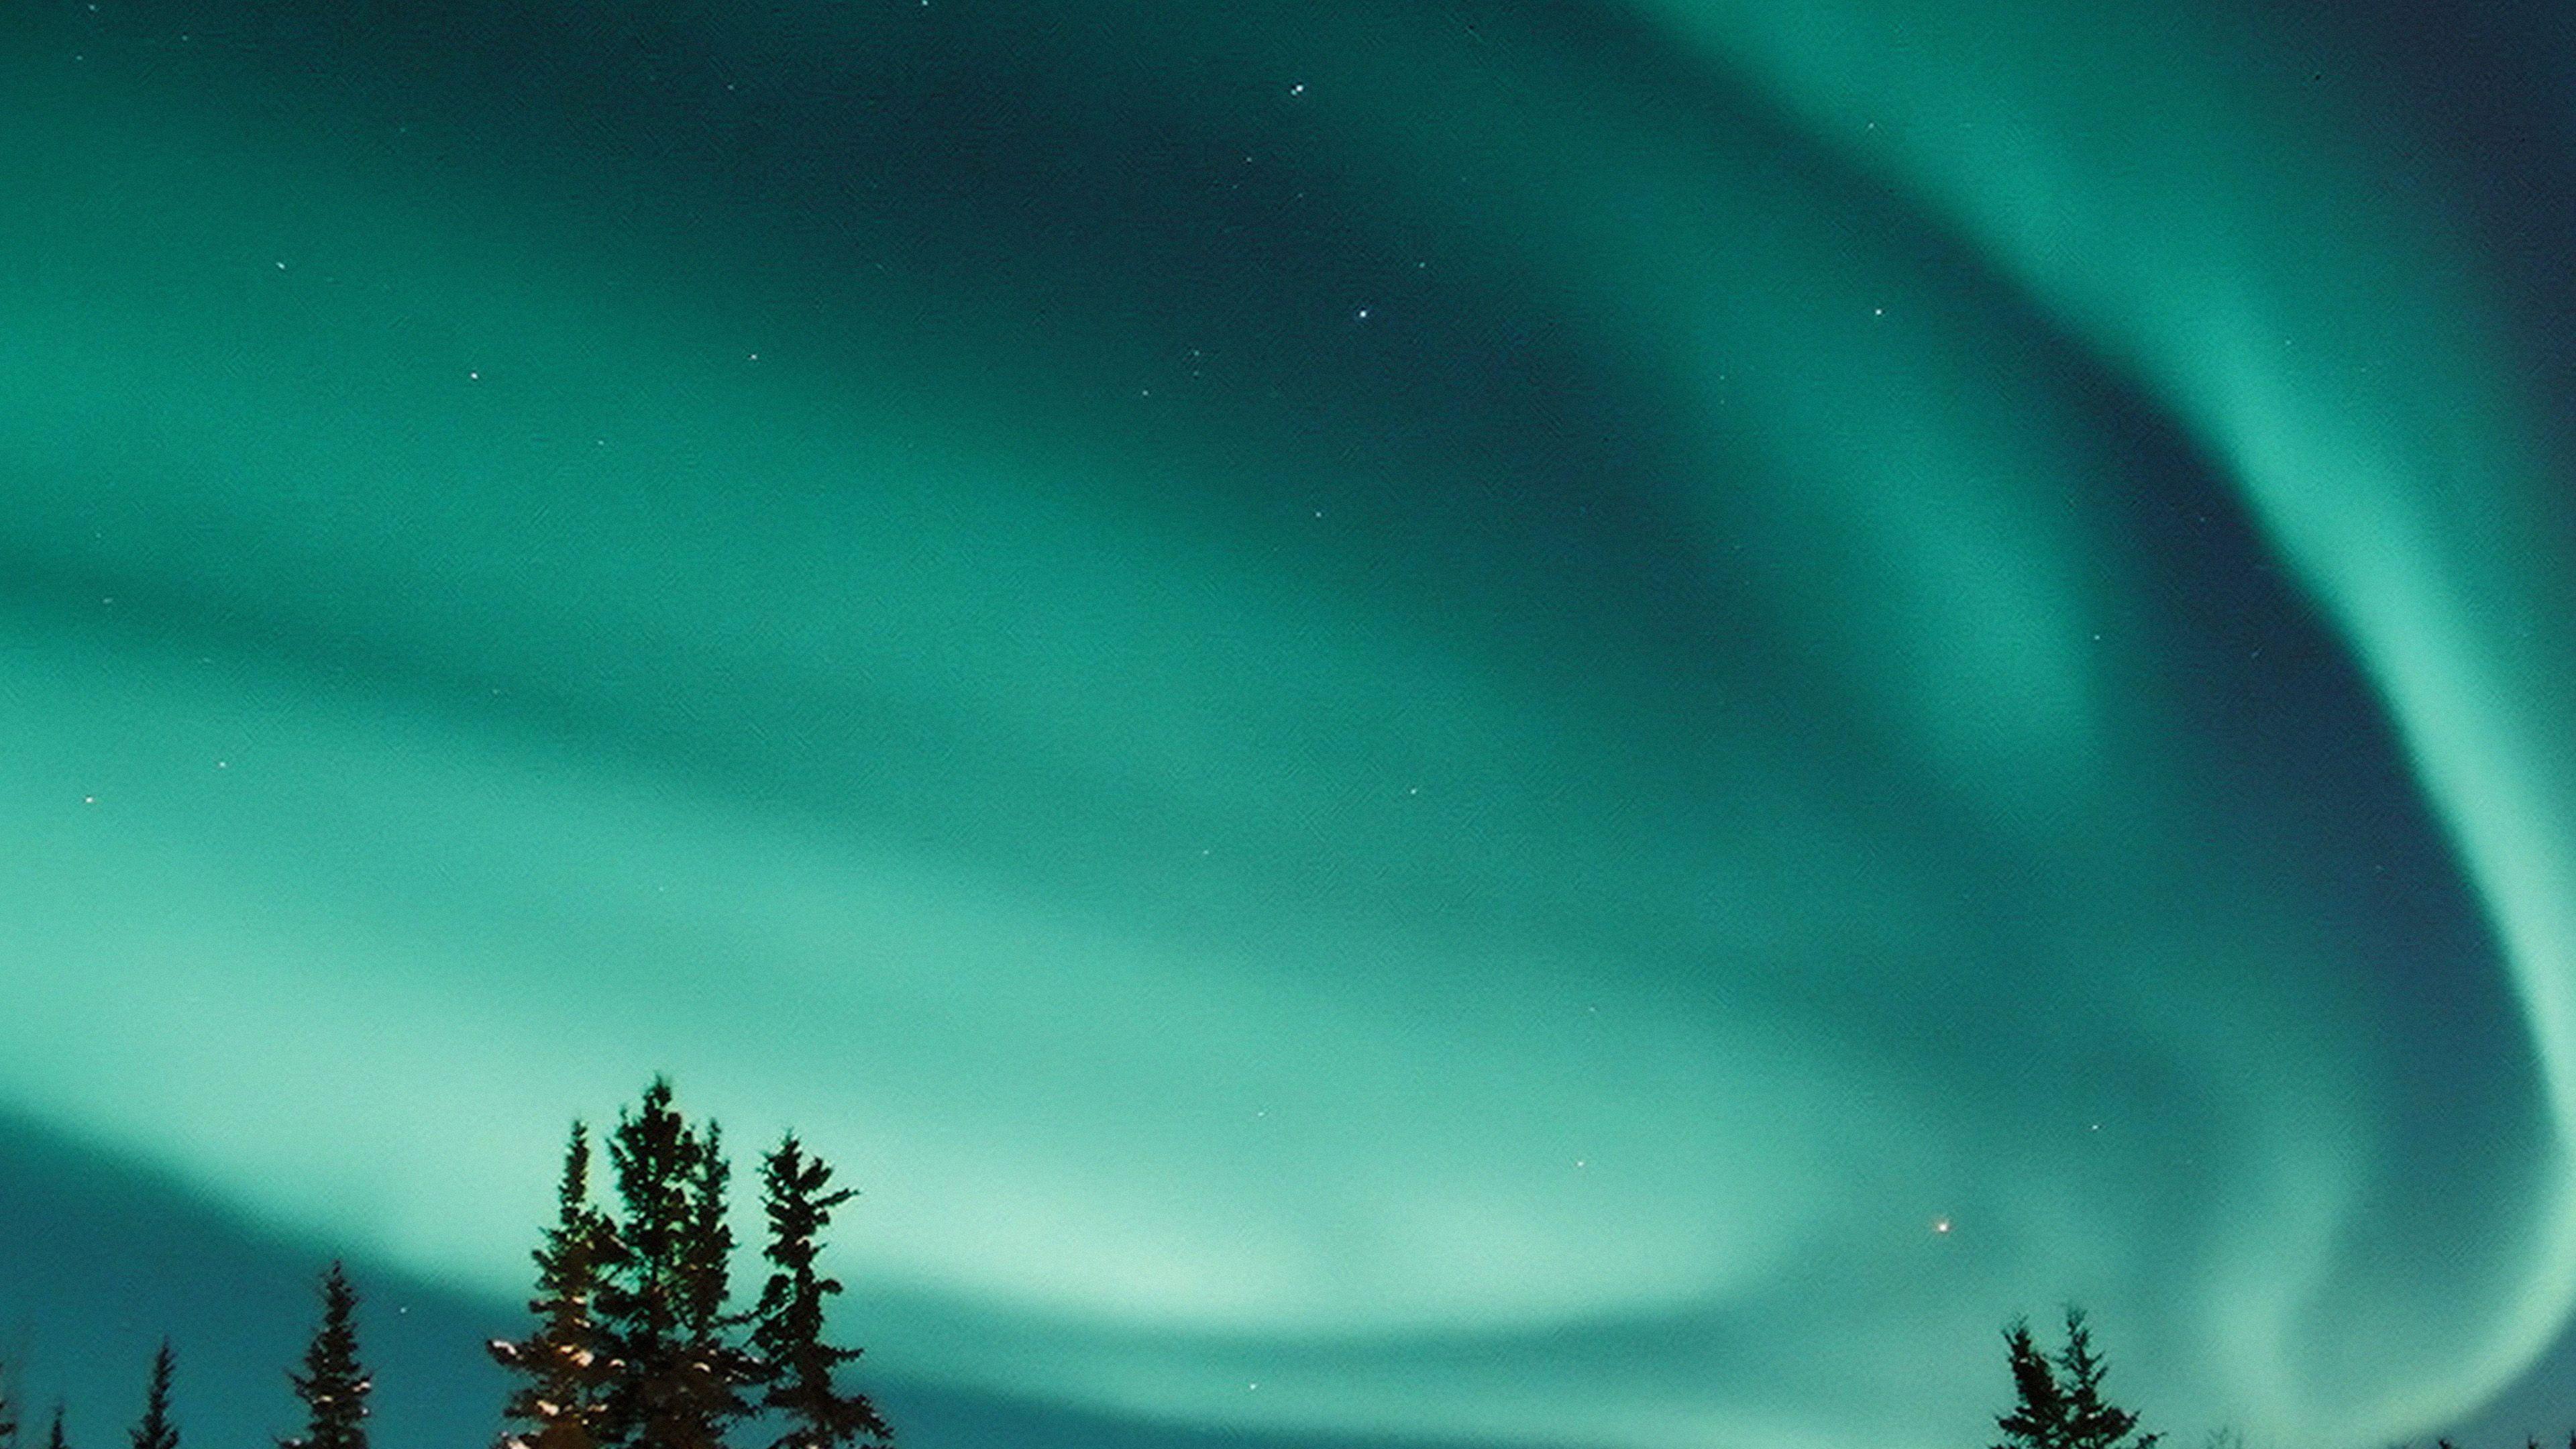 Aurora 4k wallpapers top free aurora 4k backgrounds - Space night sky wallpaper ...